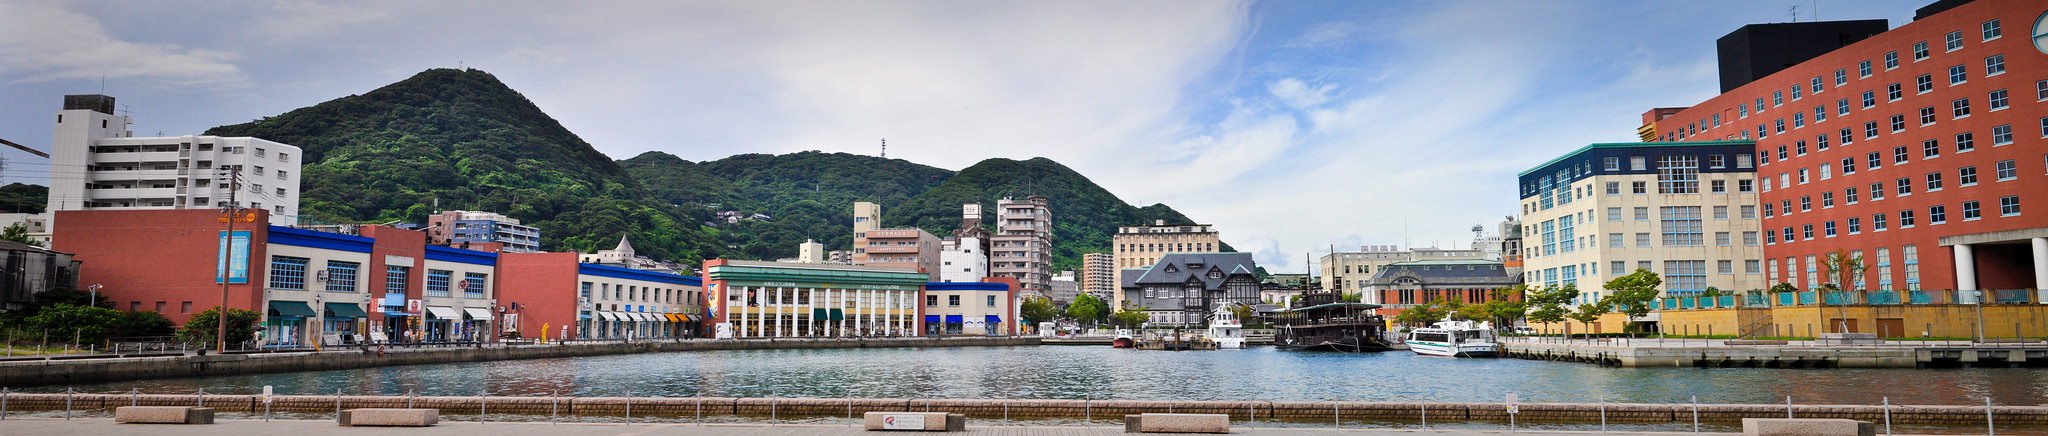 10 Things to do in Fukuoka, Japan 4